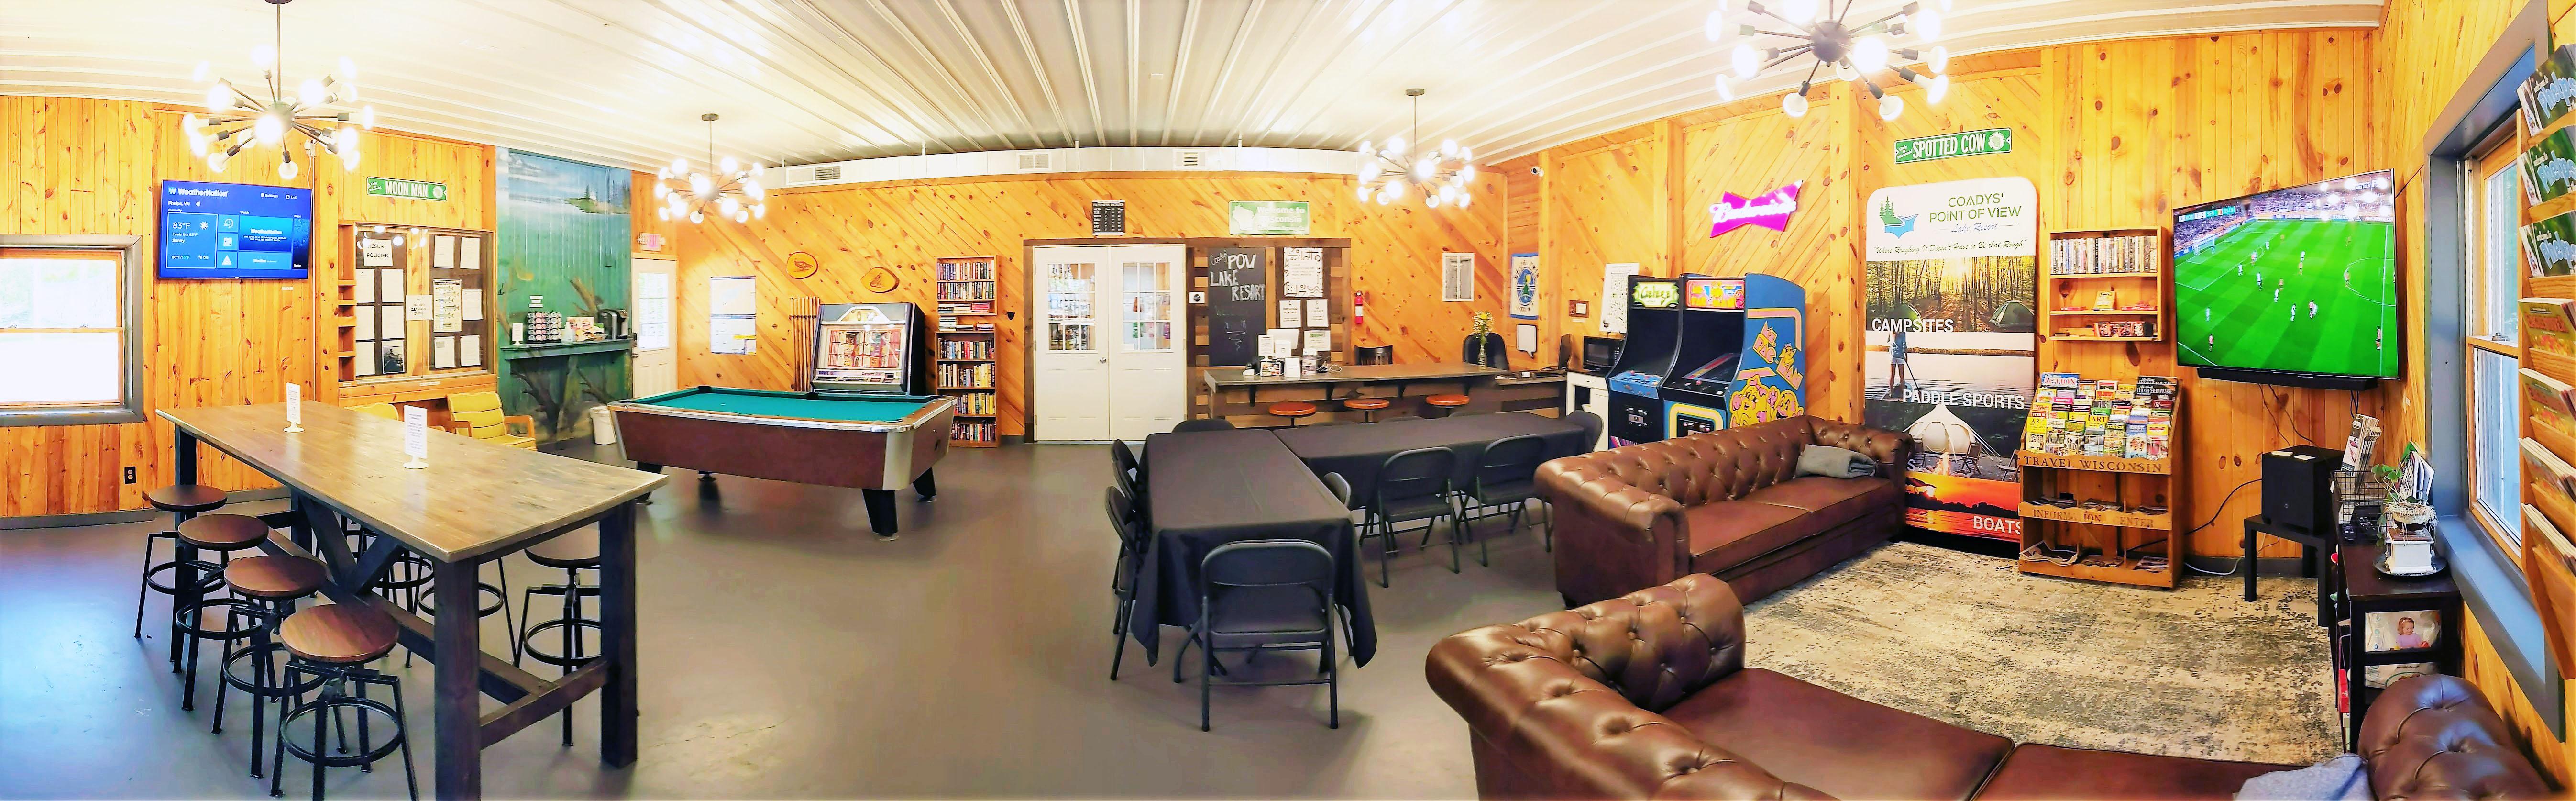 POV Rec Room